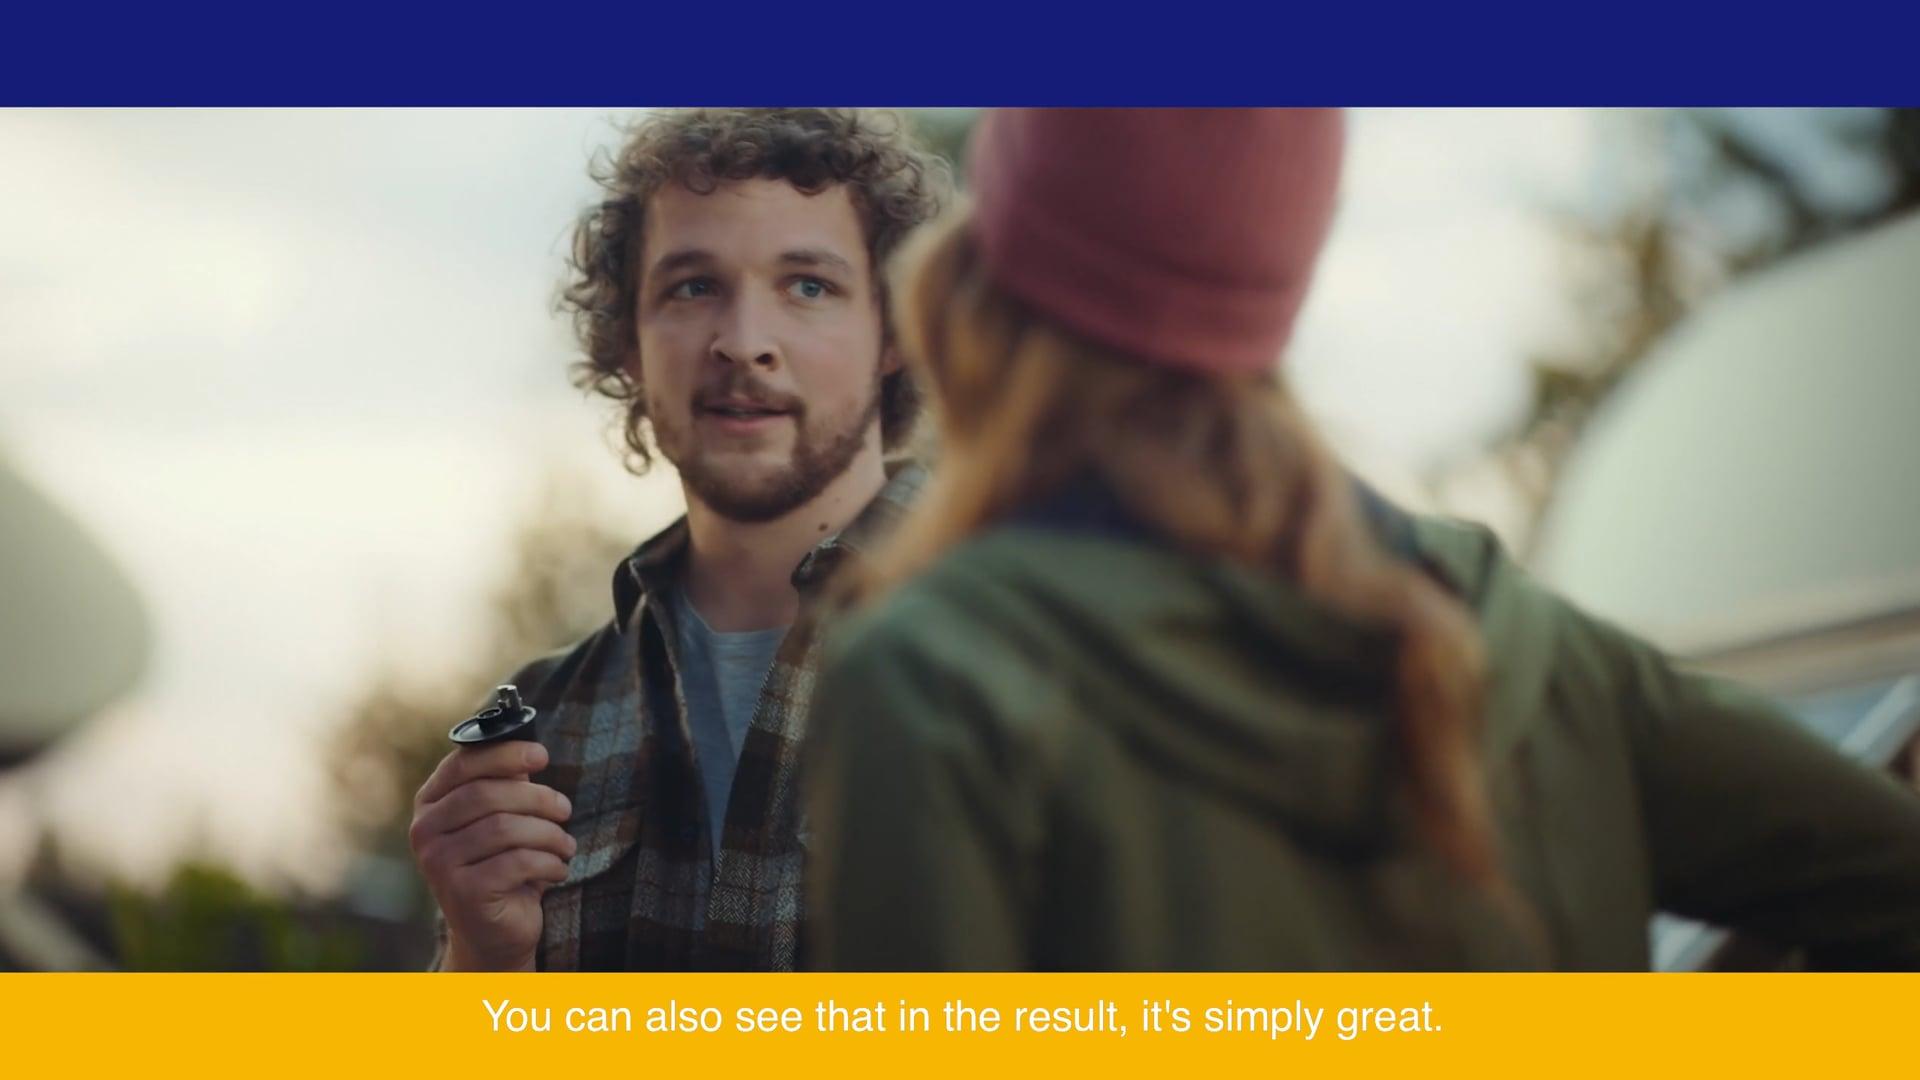 Visa - Ich zahle Visa - Hyperbowl Shoot 2020